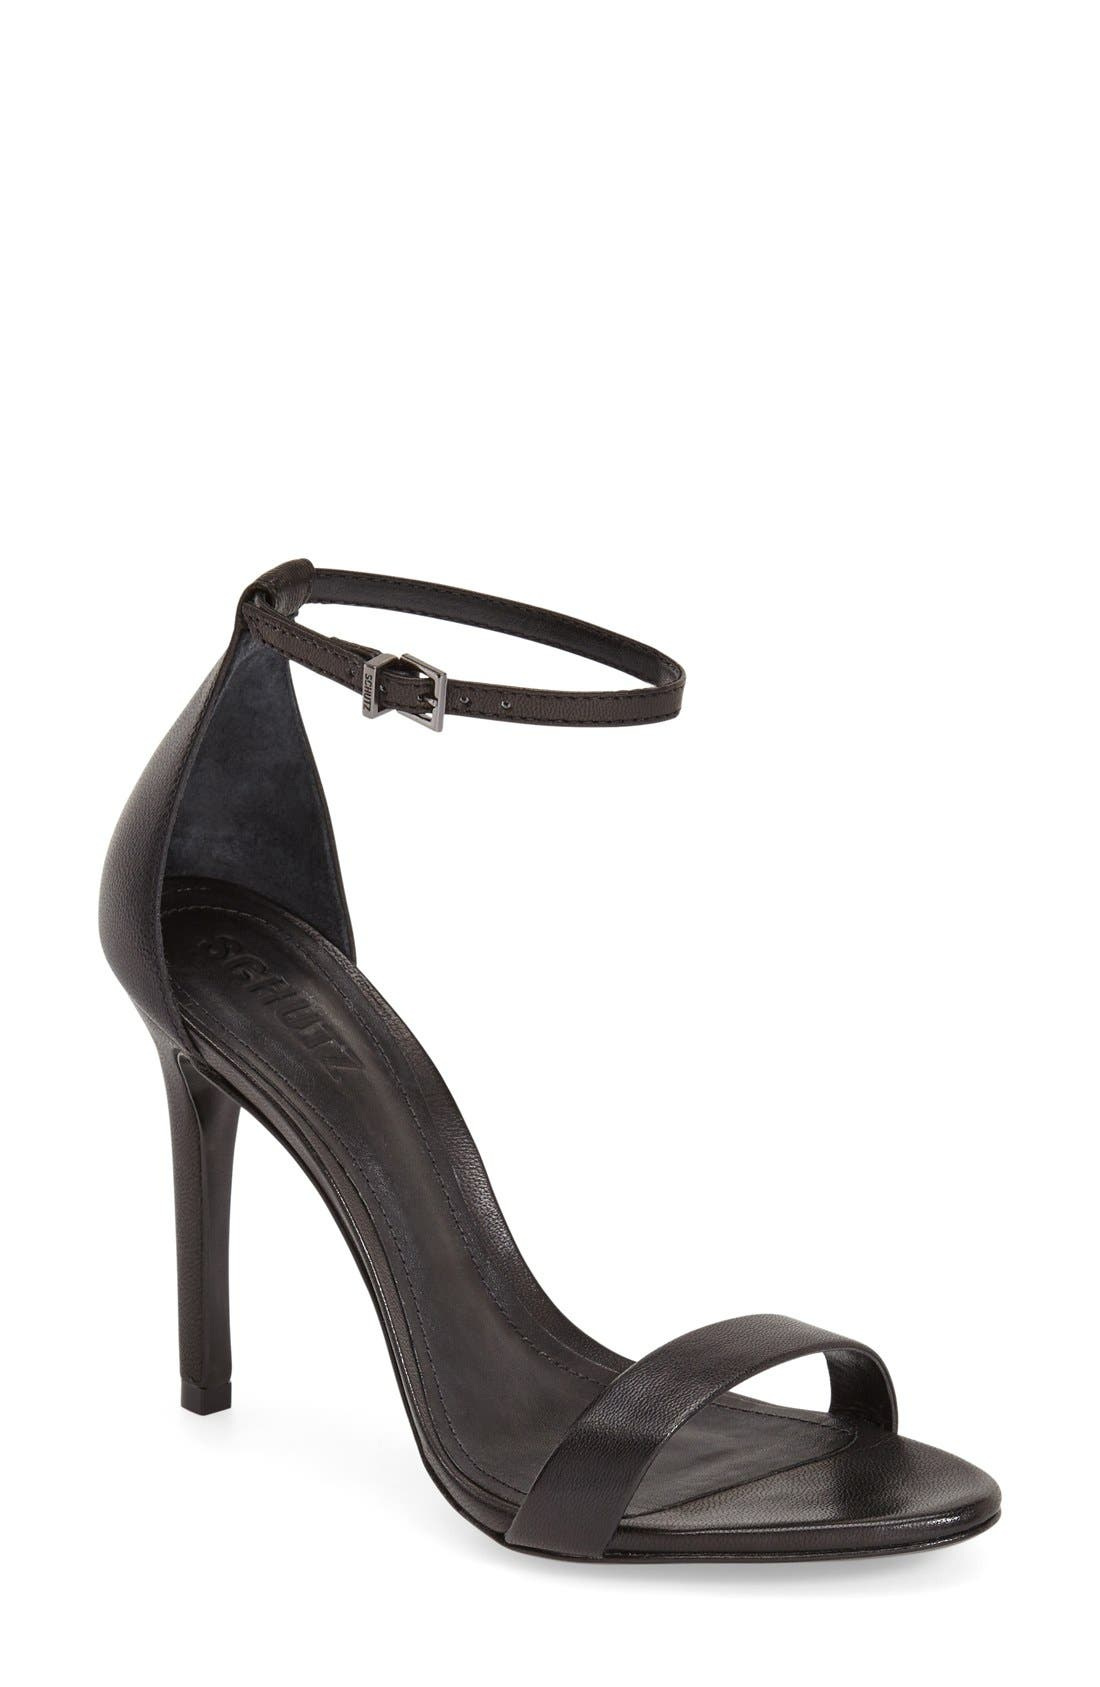 Alternate Image 1 Selected - Schutz 'Cadey Lee' Sandal (Women)